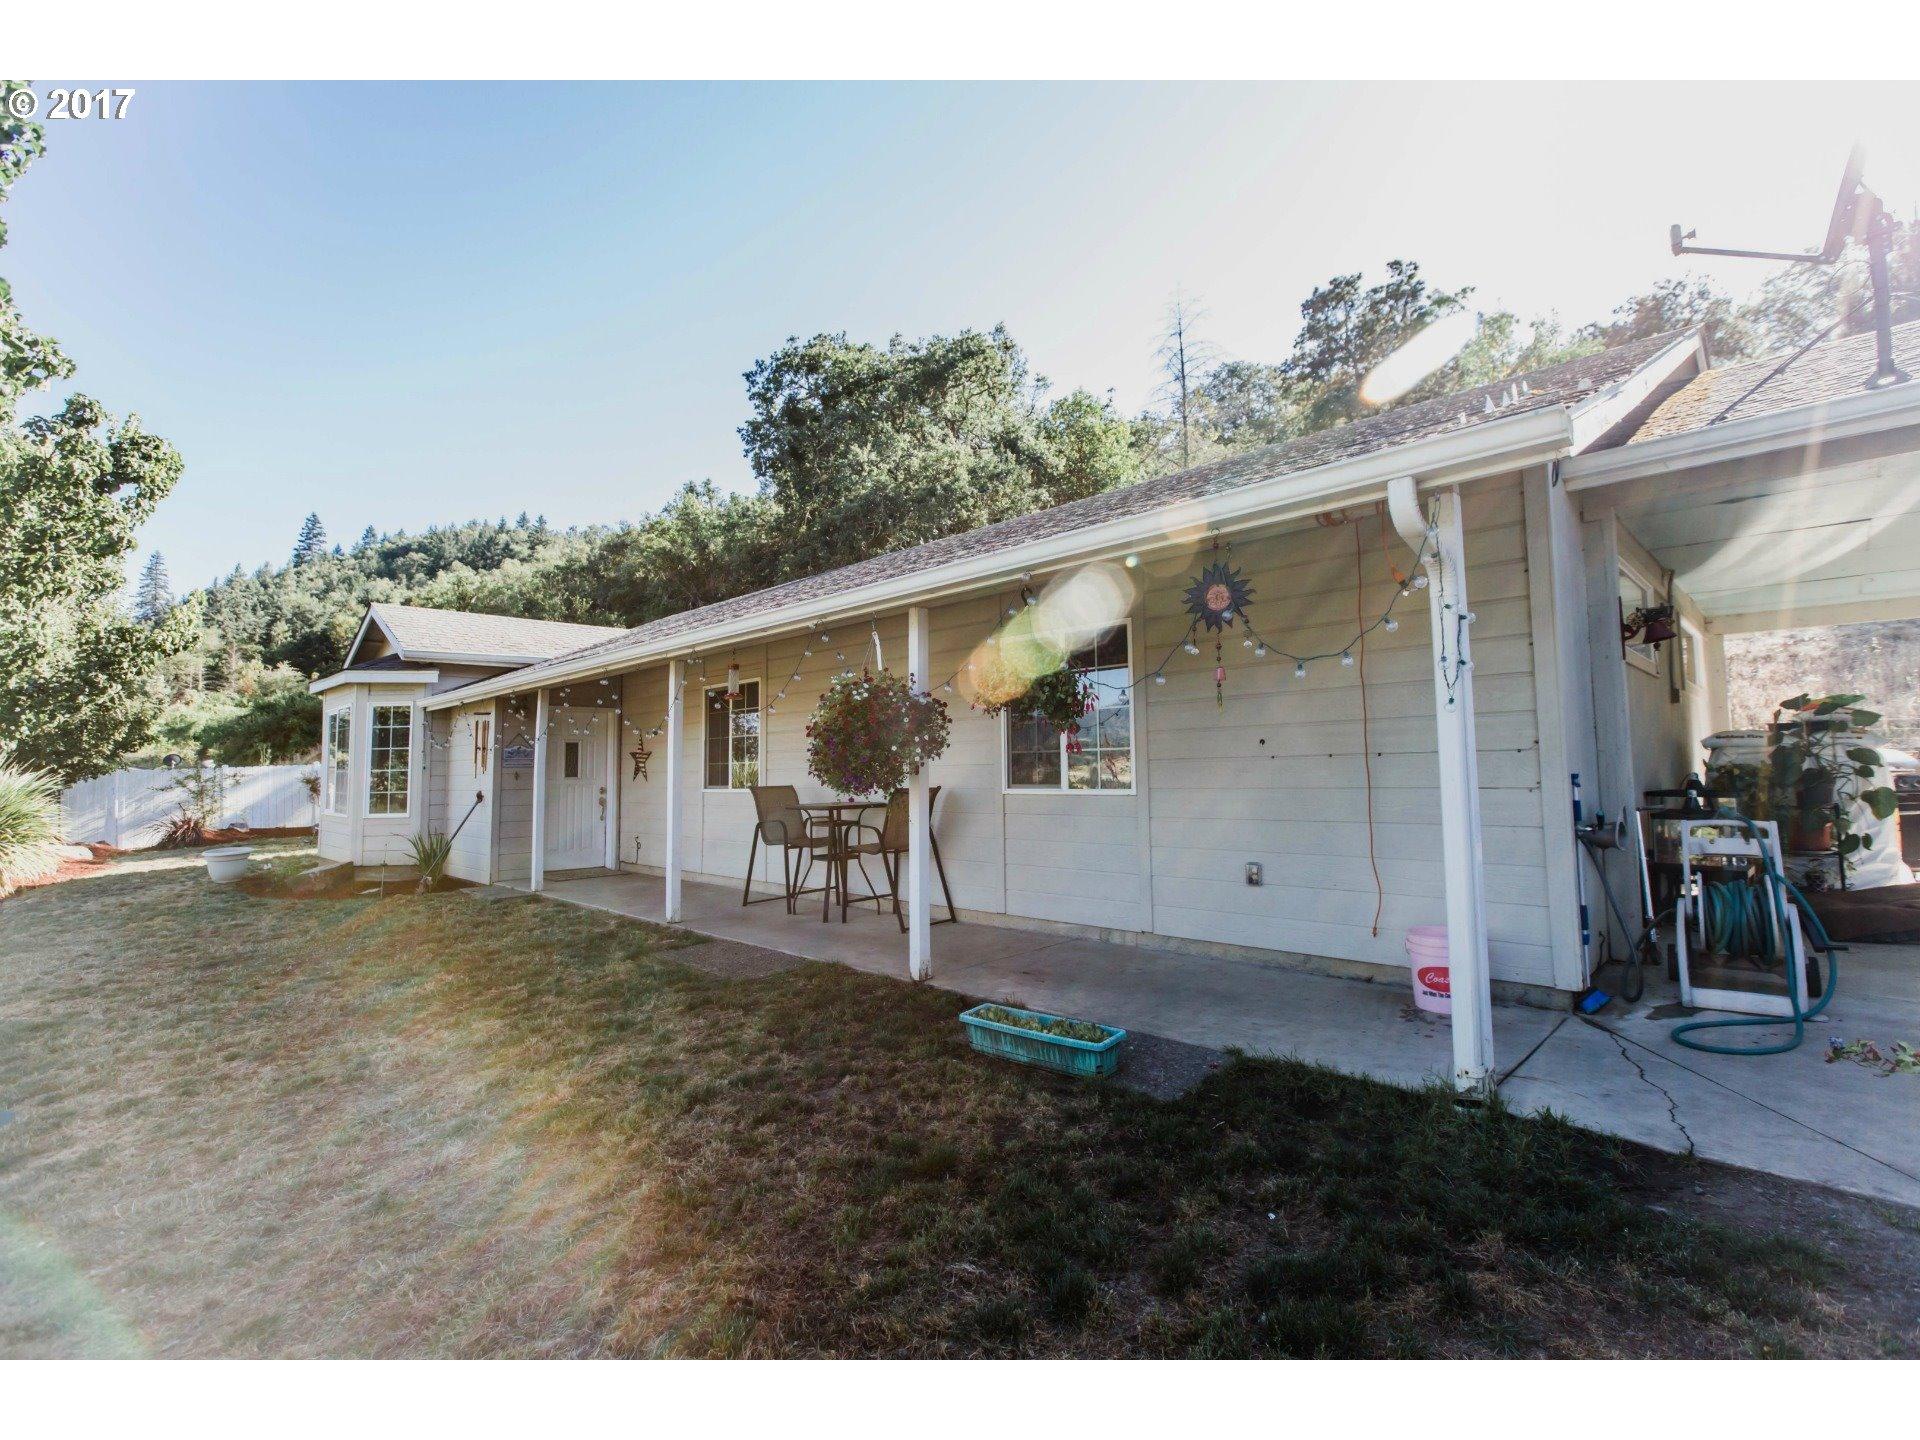 13553 OLD HIGHWAY 99 SOUTH Myrtle Creek, OR 97457 - MLS #: 17328823